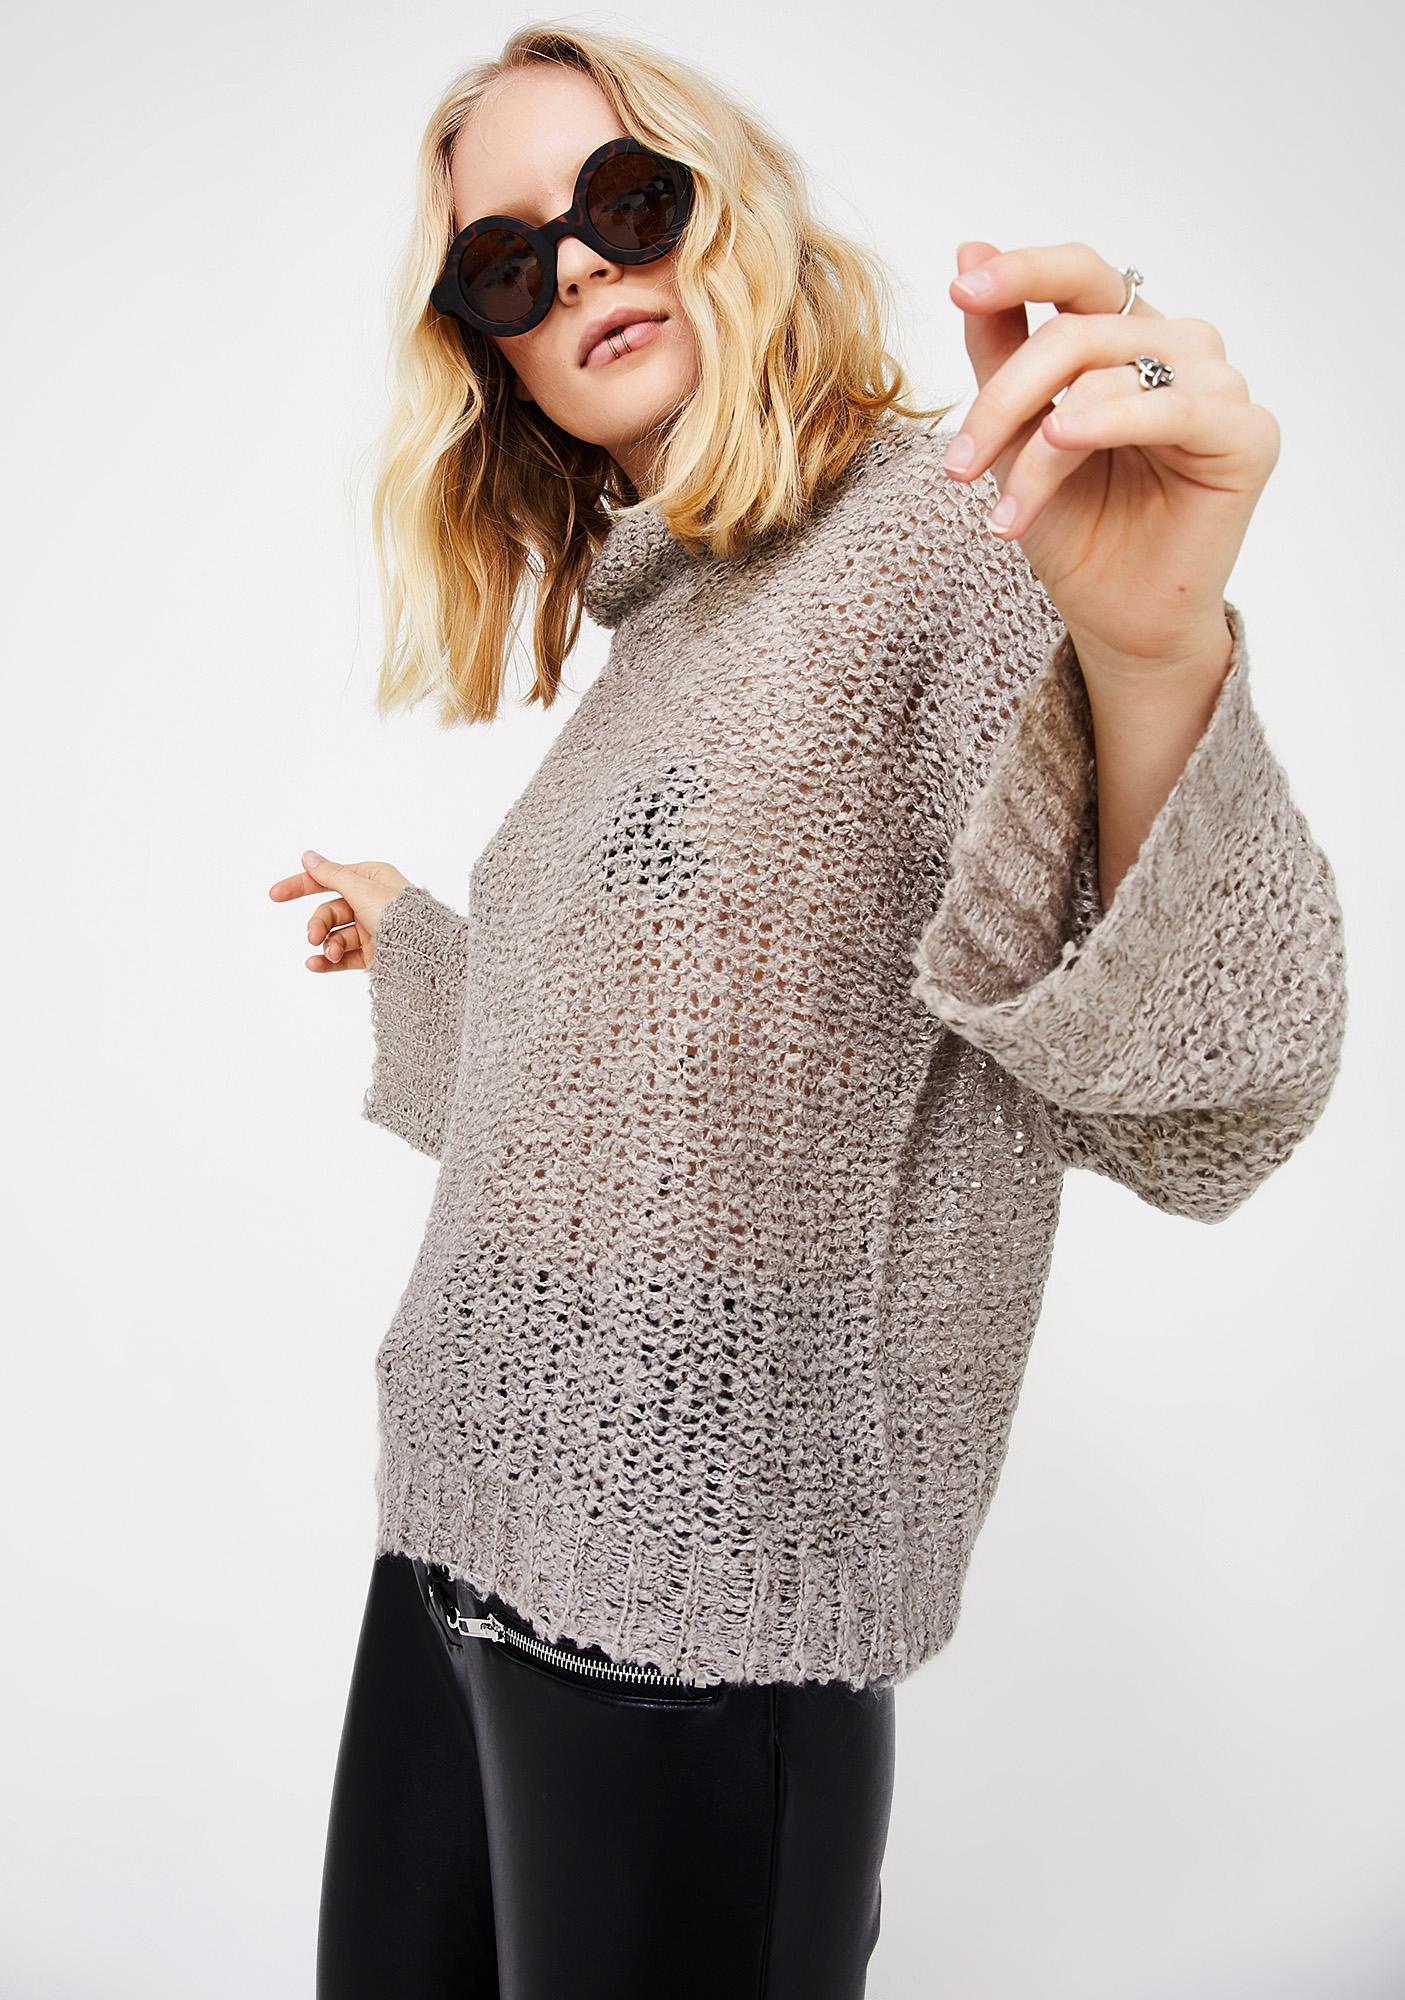 Lose My Head Sheer Sweater